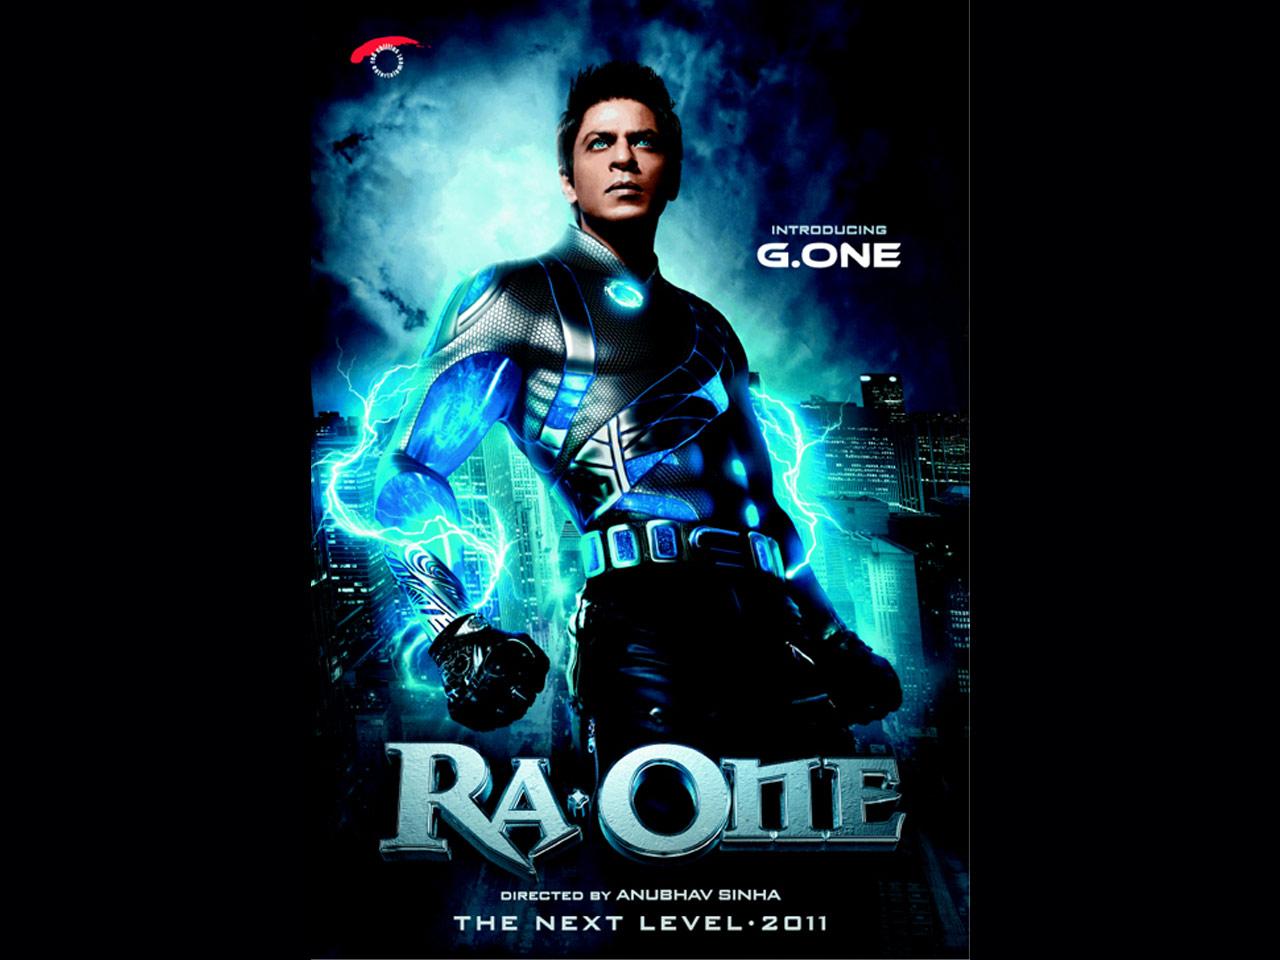 http://4.bp.blogspot.com/-u2D6p02VQR4/TkTZpsNzKdI/AAAAAAAABLc/CJEpynre918/s1600/Ra_1_Shahrukh_movie_wallpaper+%25281%2529.jpg